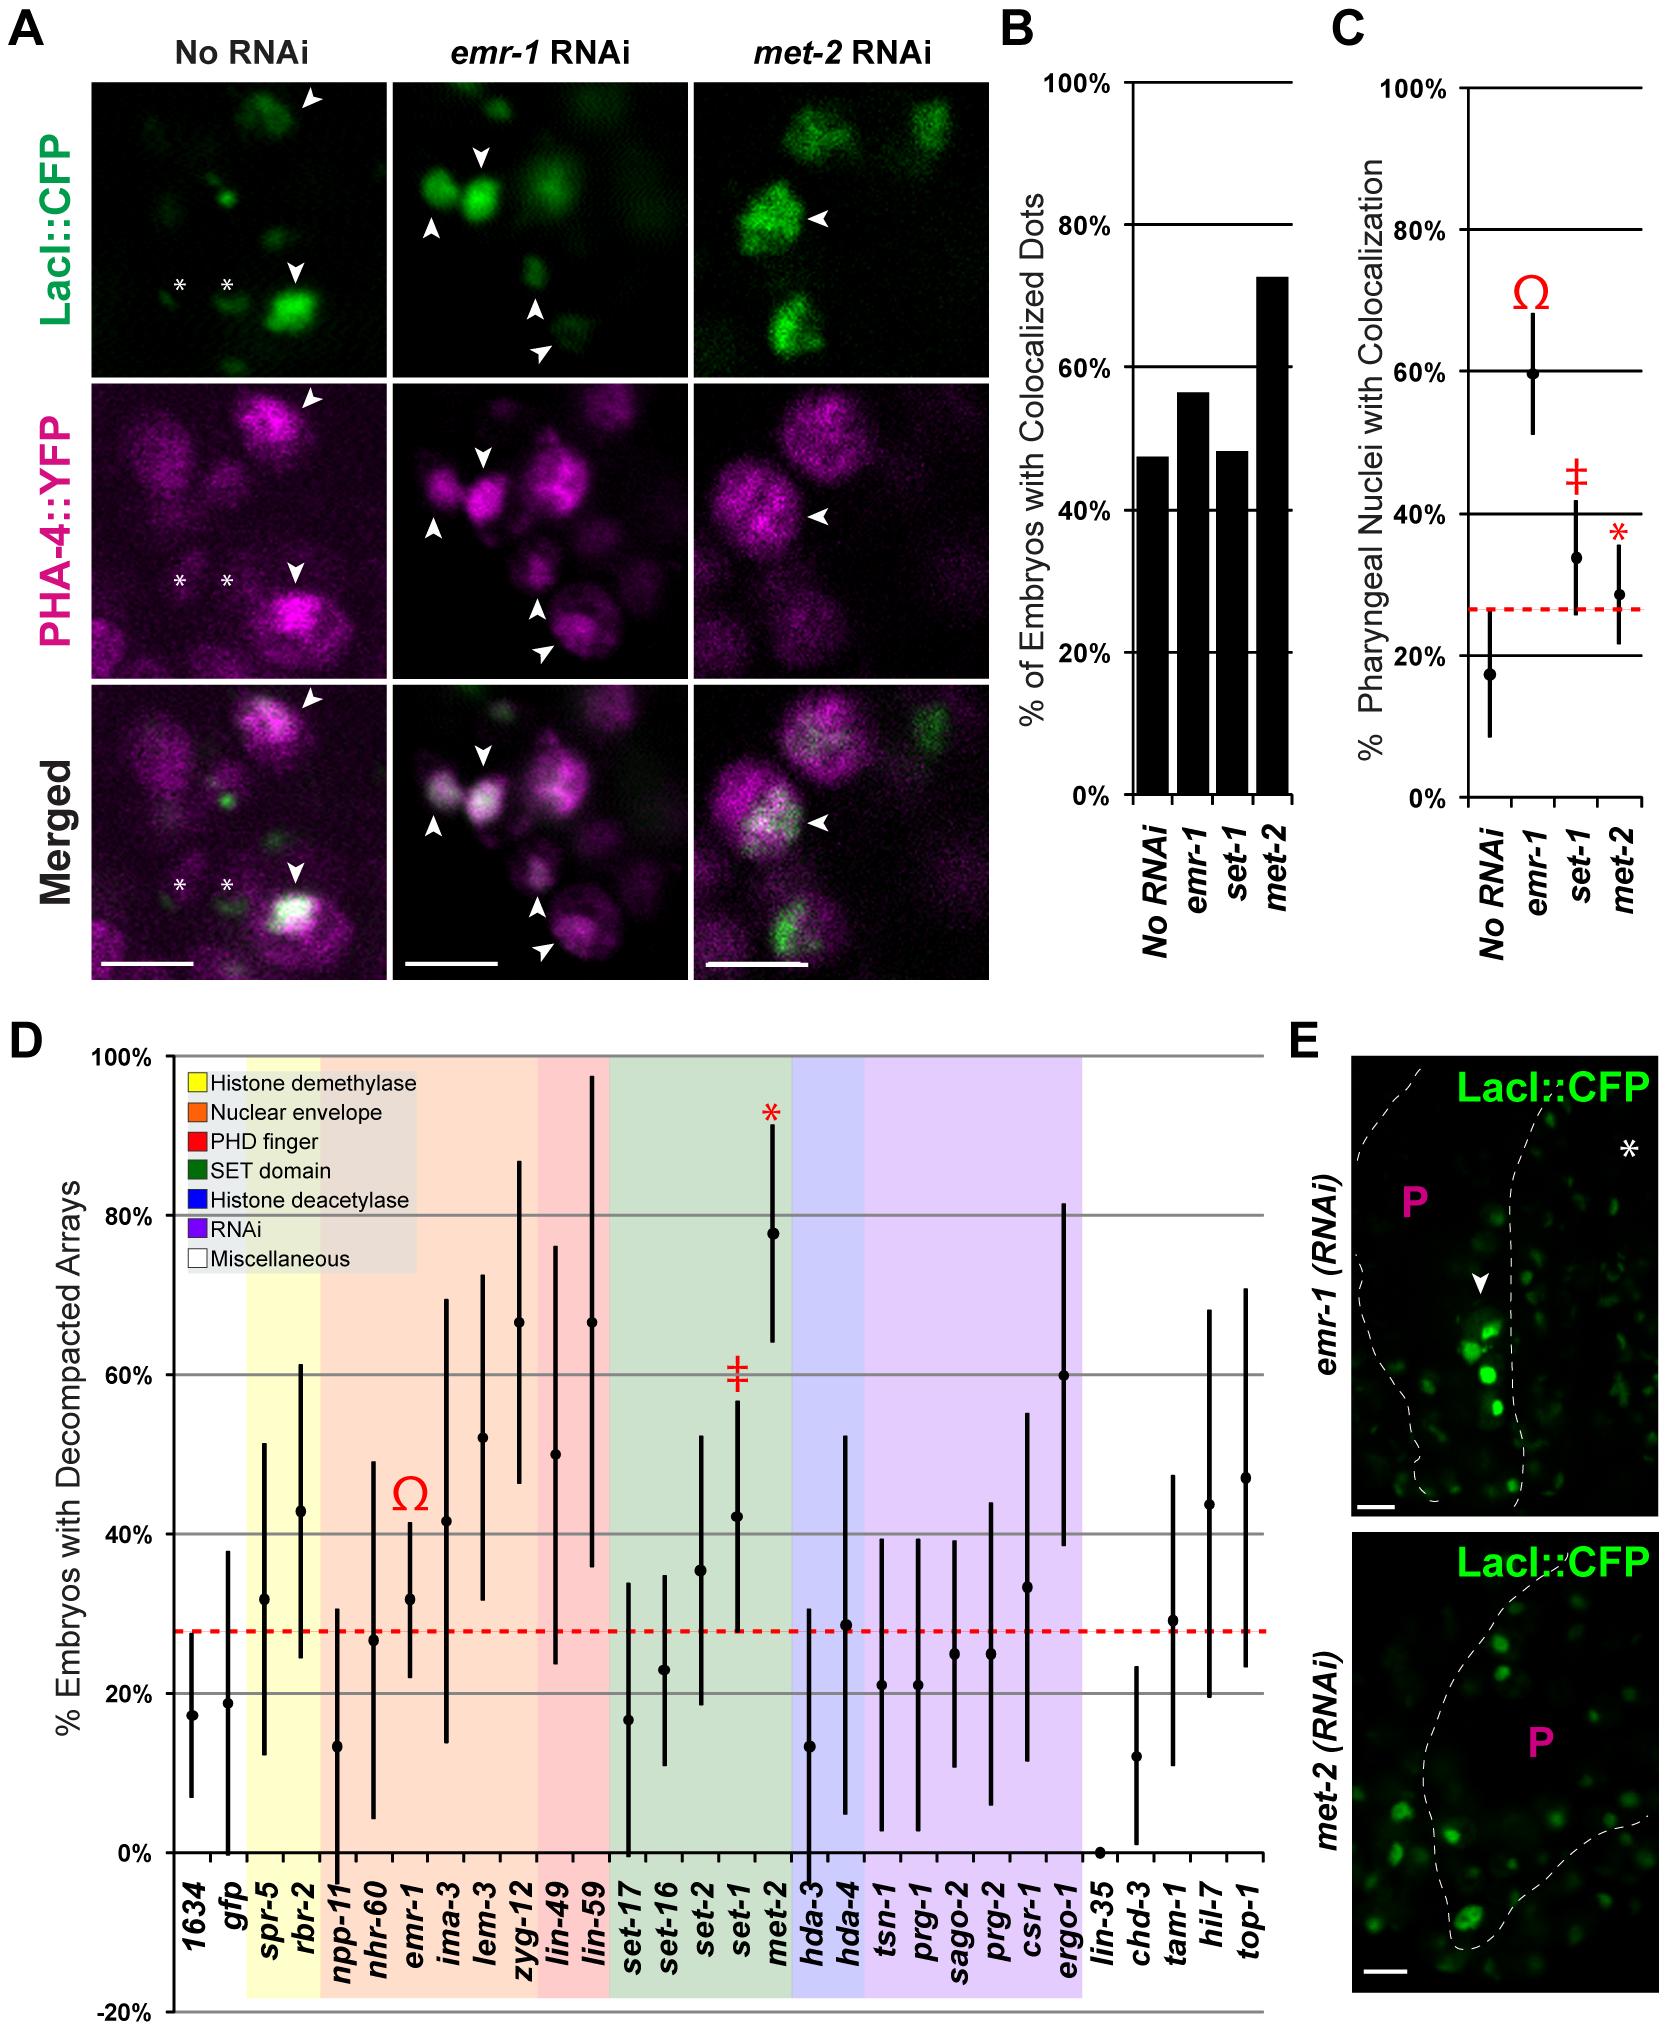 Emerin inhibits PHA-4 binding in the pharynx.